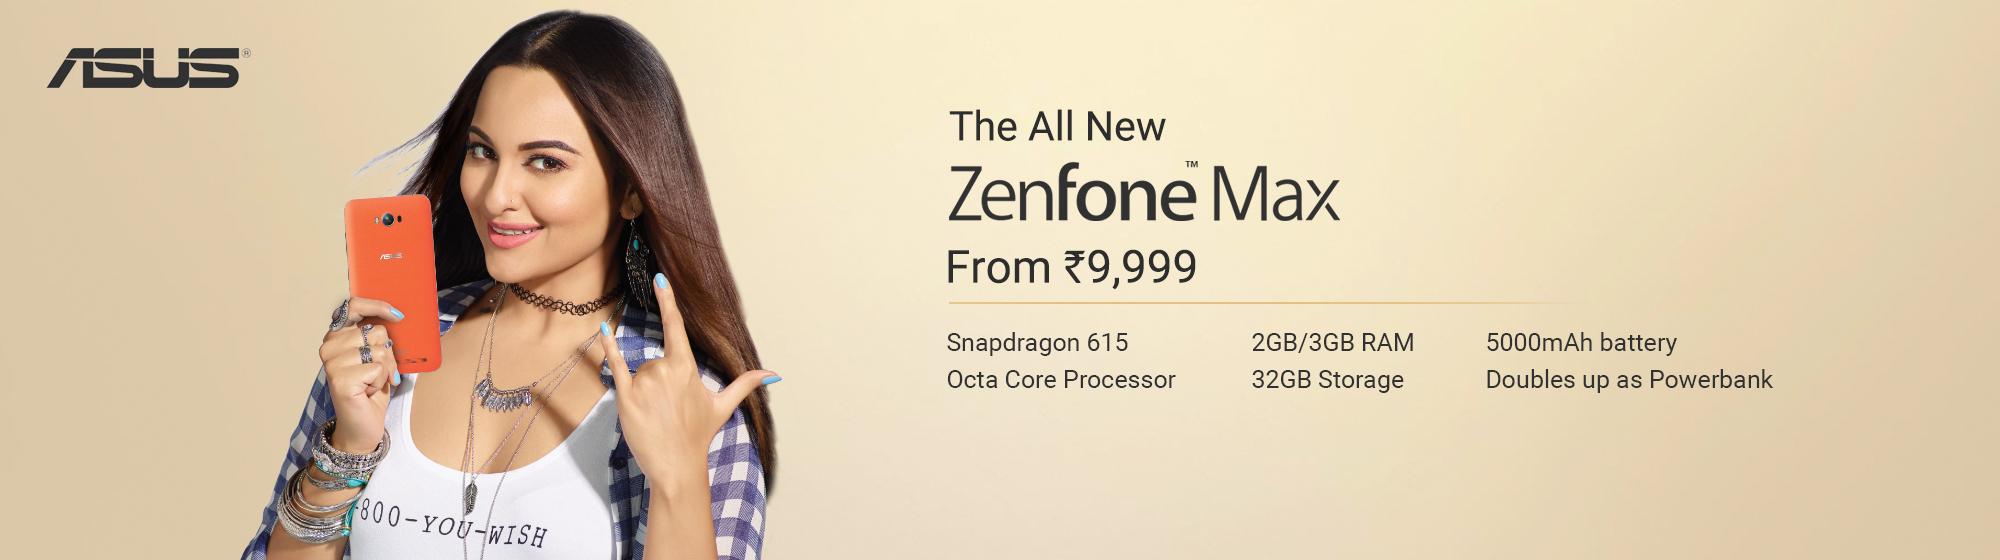 Asus Zenfone Max (2016) Mobile